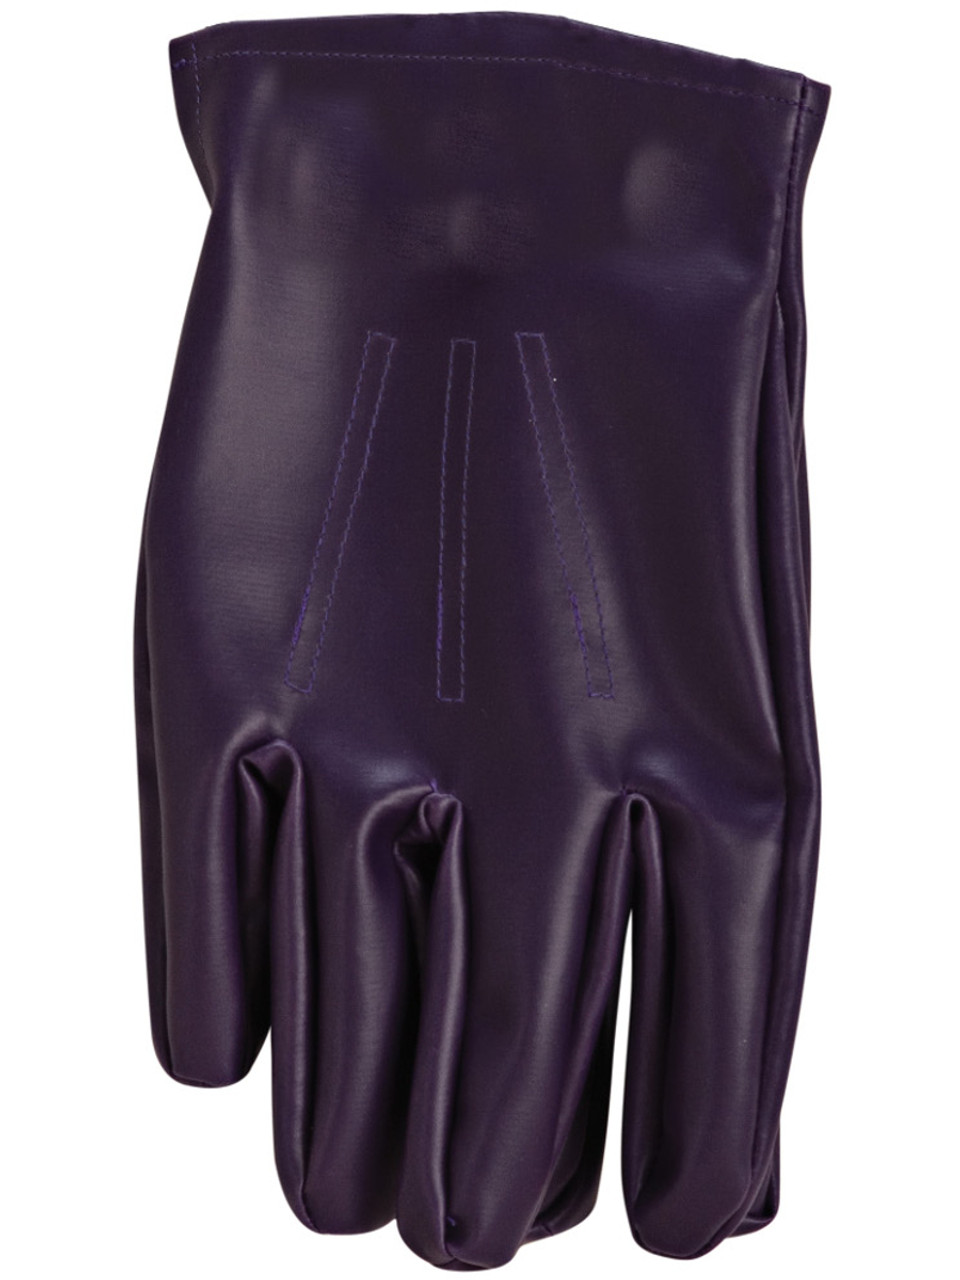 71ccb1797cc23 Batman The Dark Knight Movie Child Costume The Joker Gloves